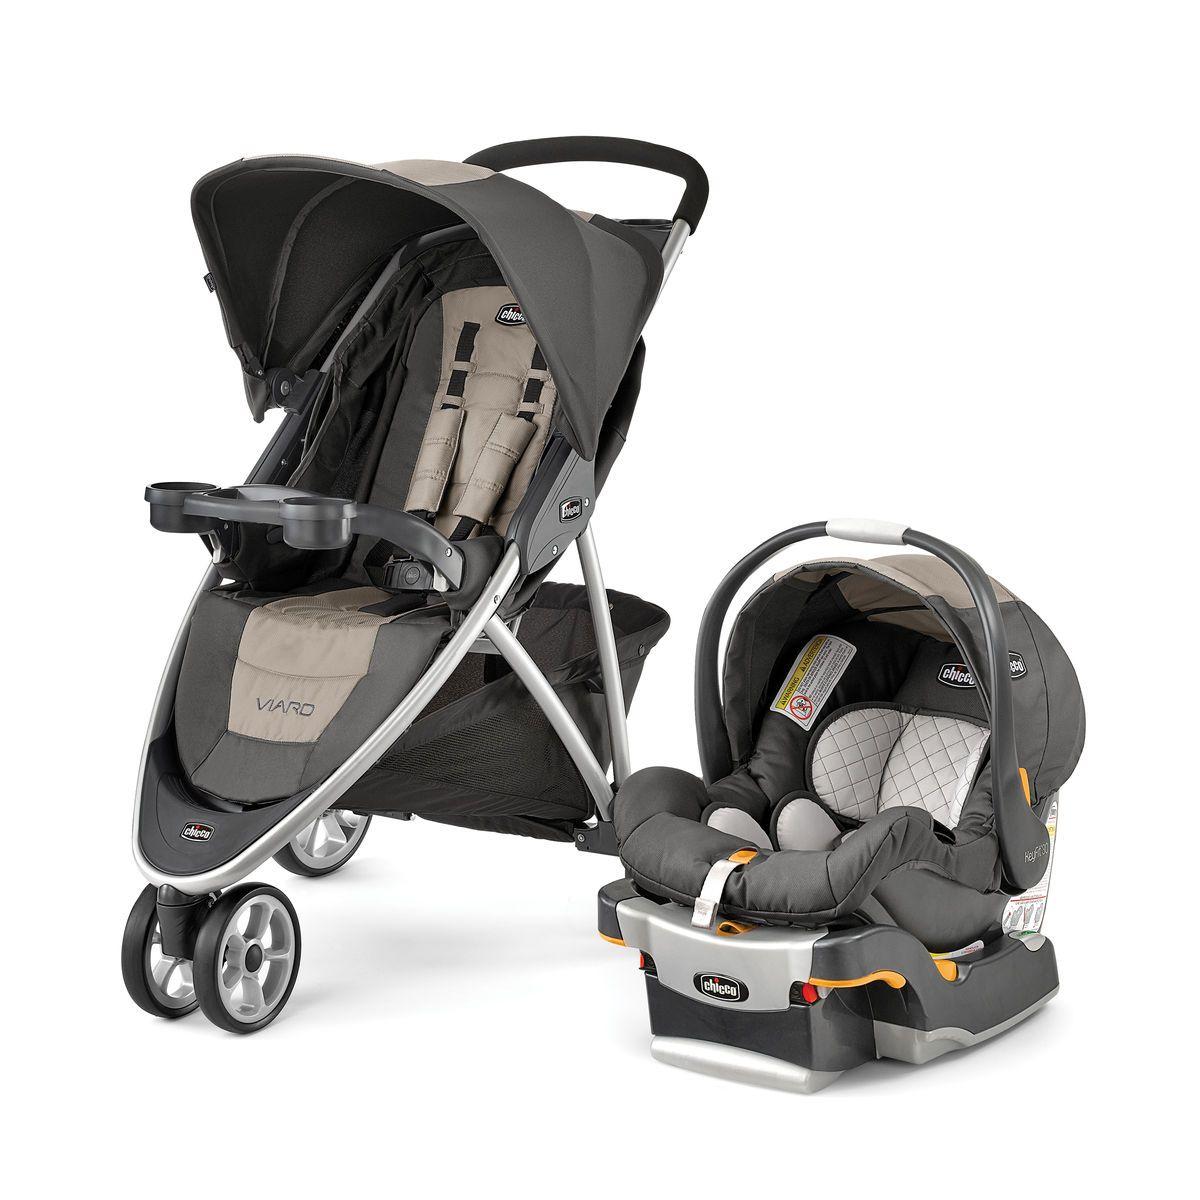 Viaro ® Stroller Features Convenient onehand quick